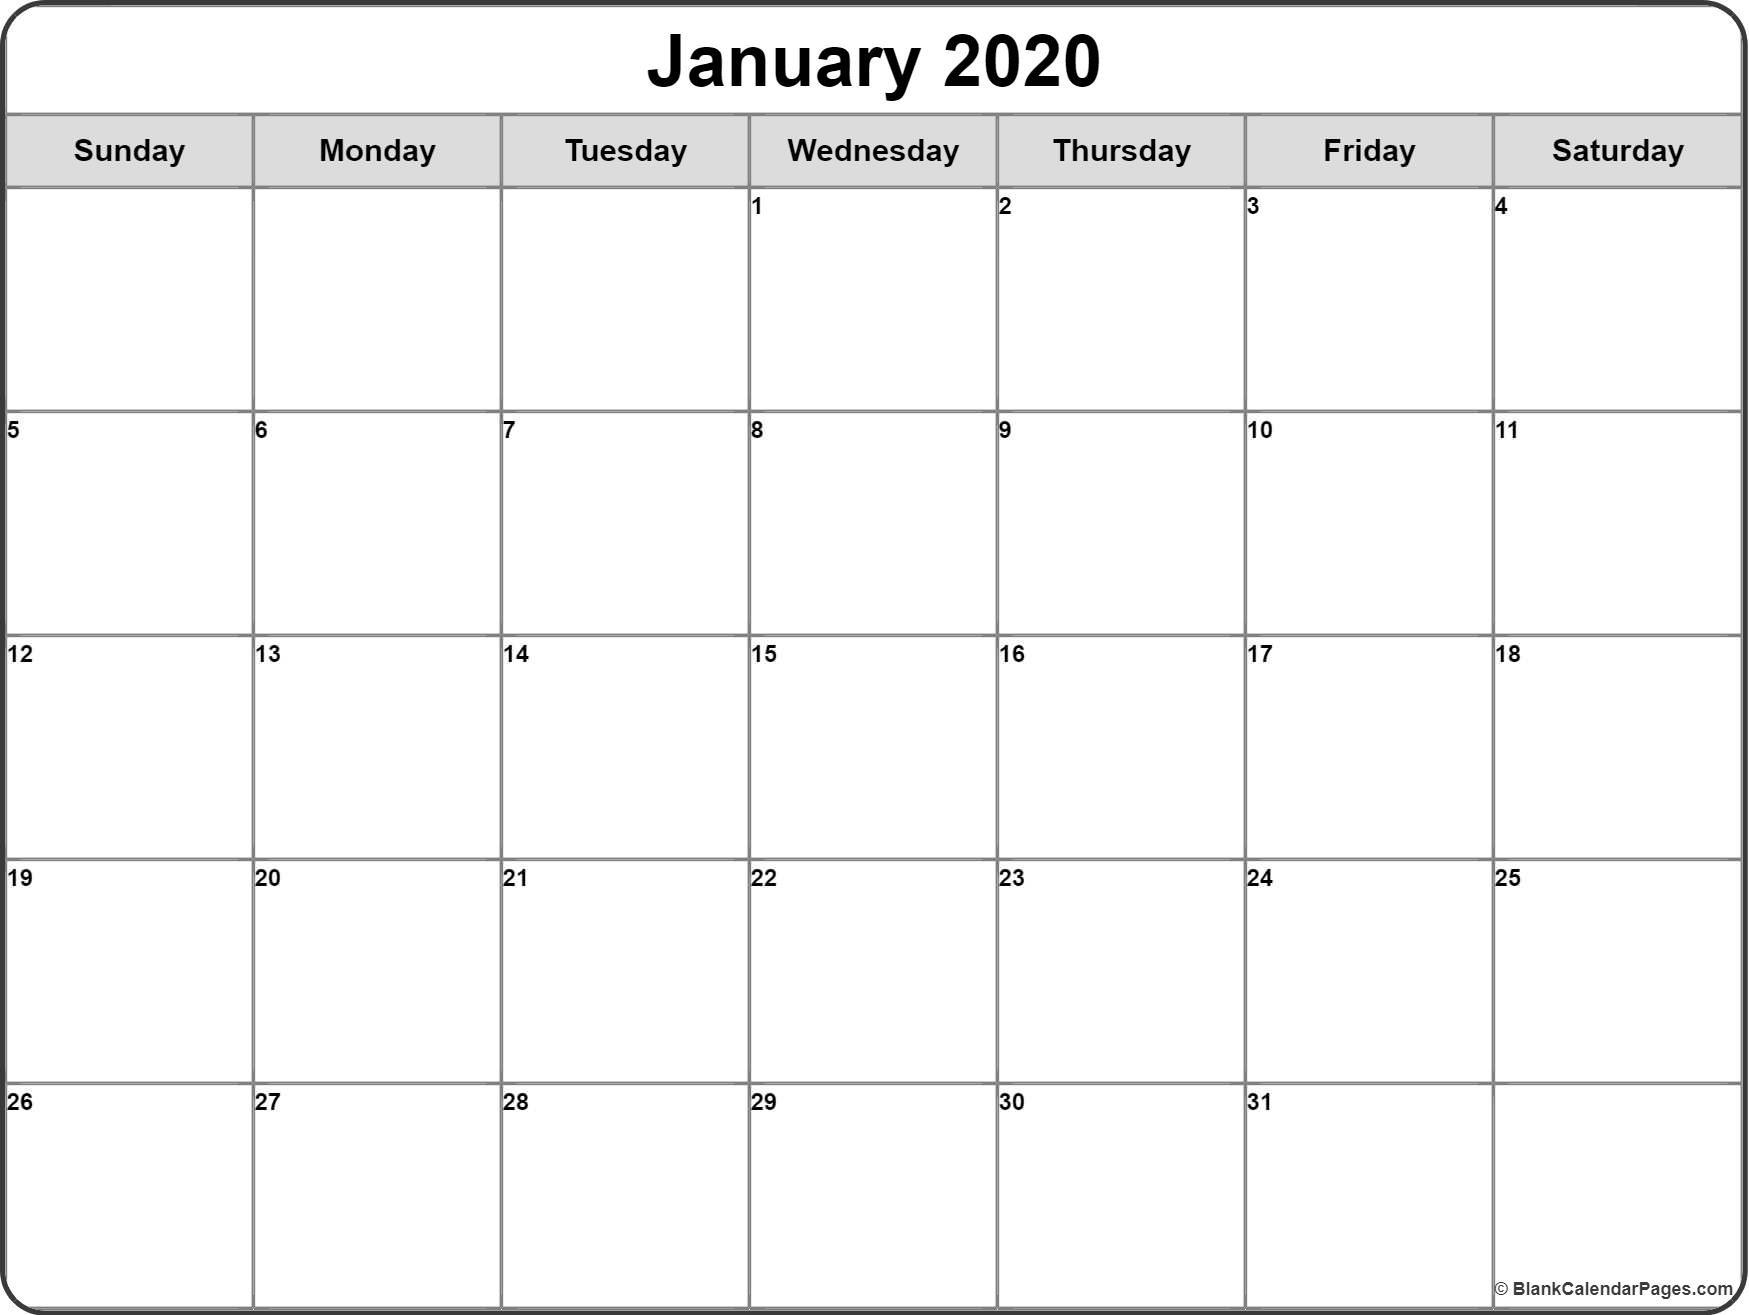 Free Monthly Calendar 2020 Printable - Akali  Printable Bill Pay Calendar 2020